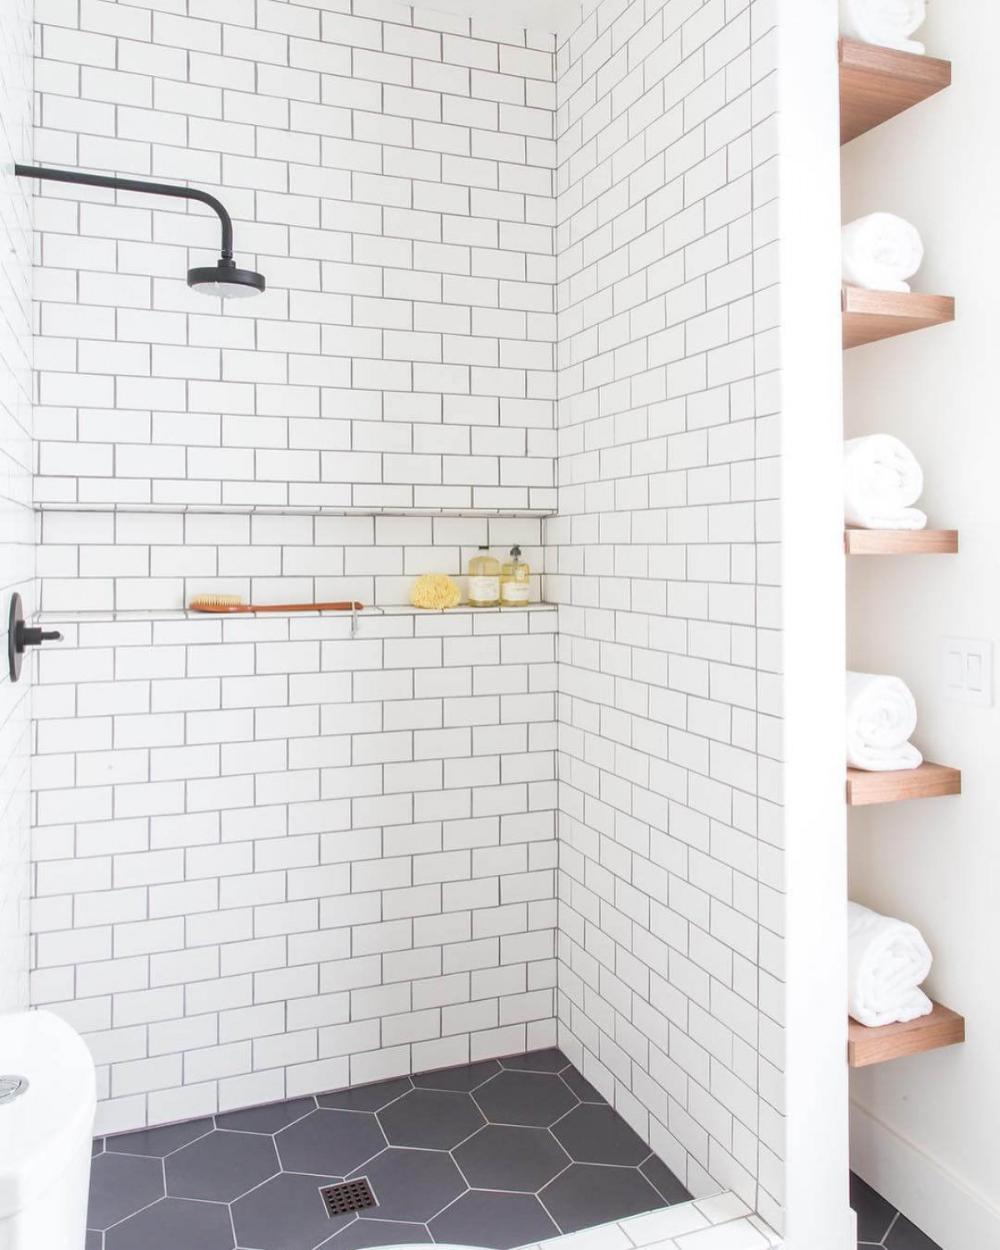 11 Brilliant Walk-in Shower Ideas for Small Bathrooms | British Ceramic Tile